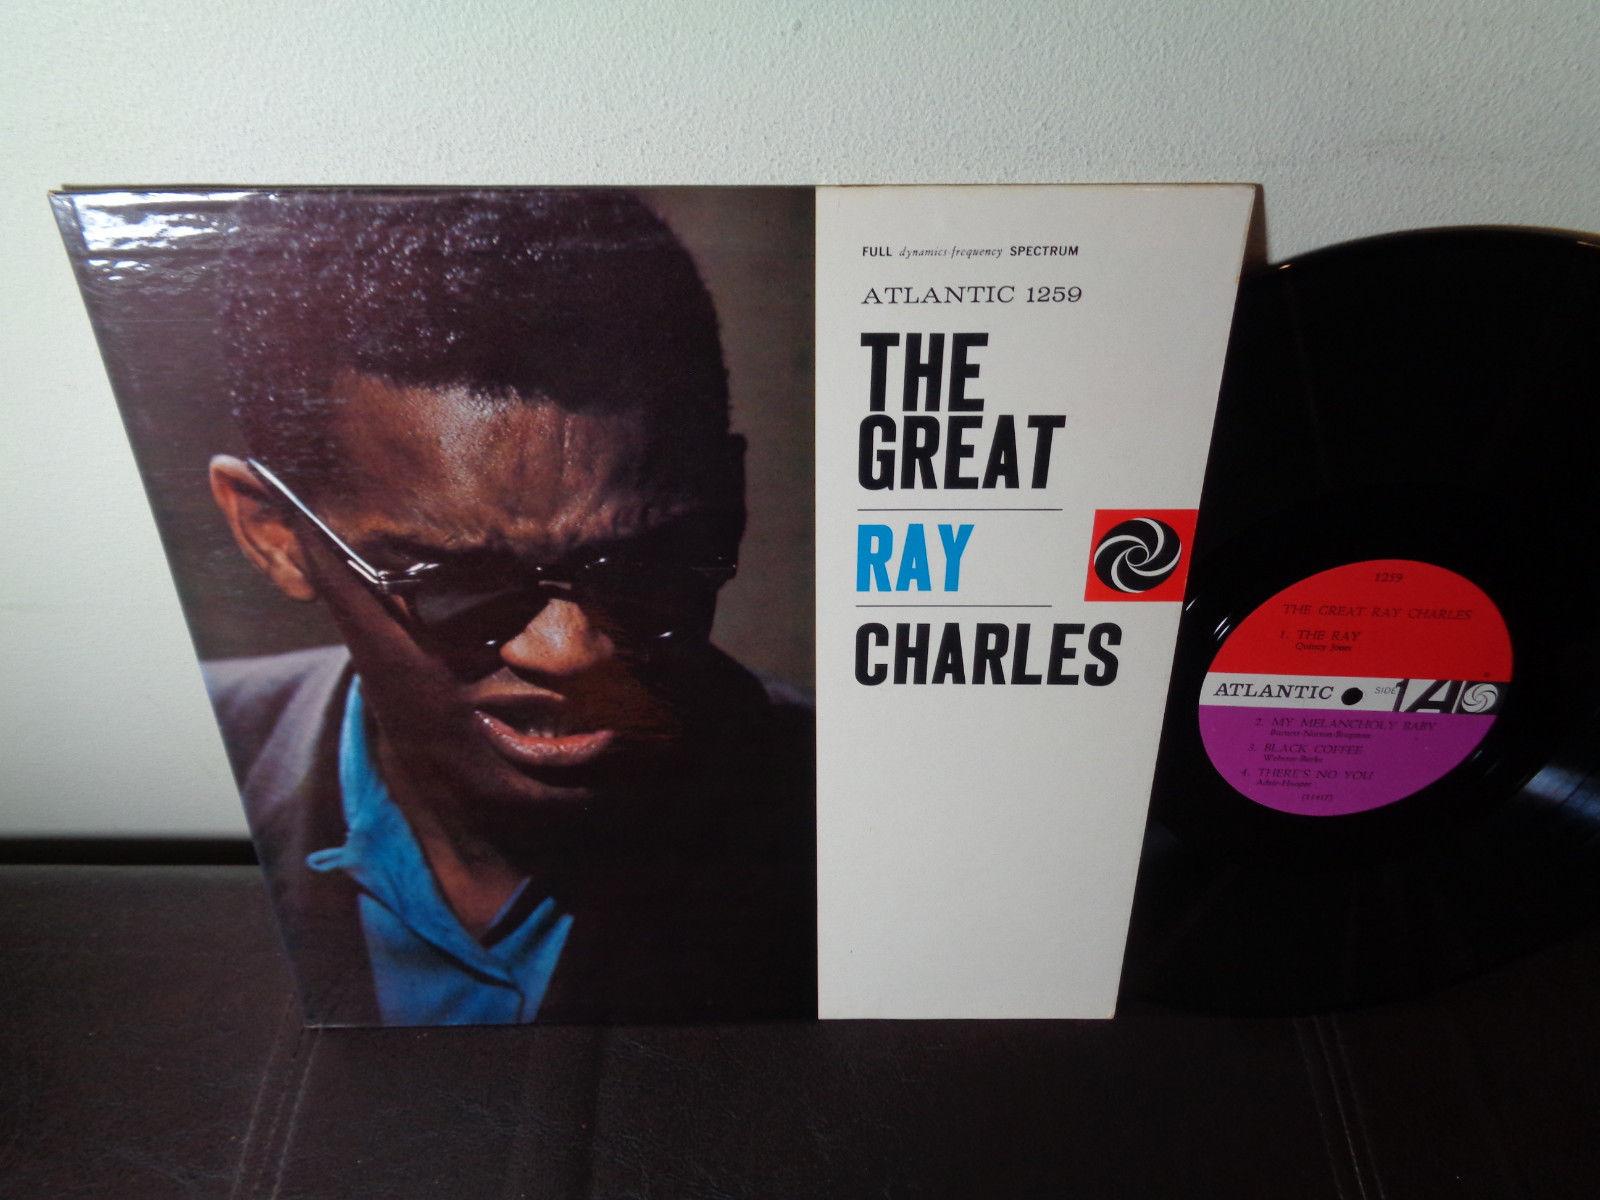 RAY CHARLES ATLANTIC 1369 MONO VG++ 1960 / R&B Soul Jazz / THE GREAT RAY CHARLES